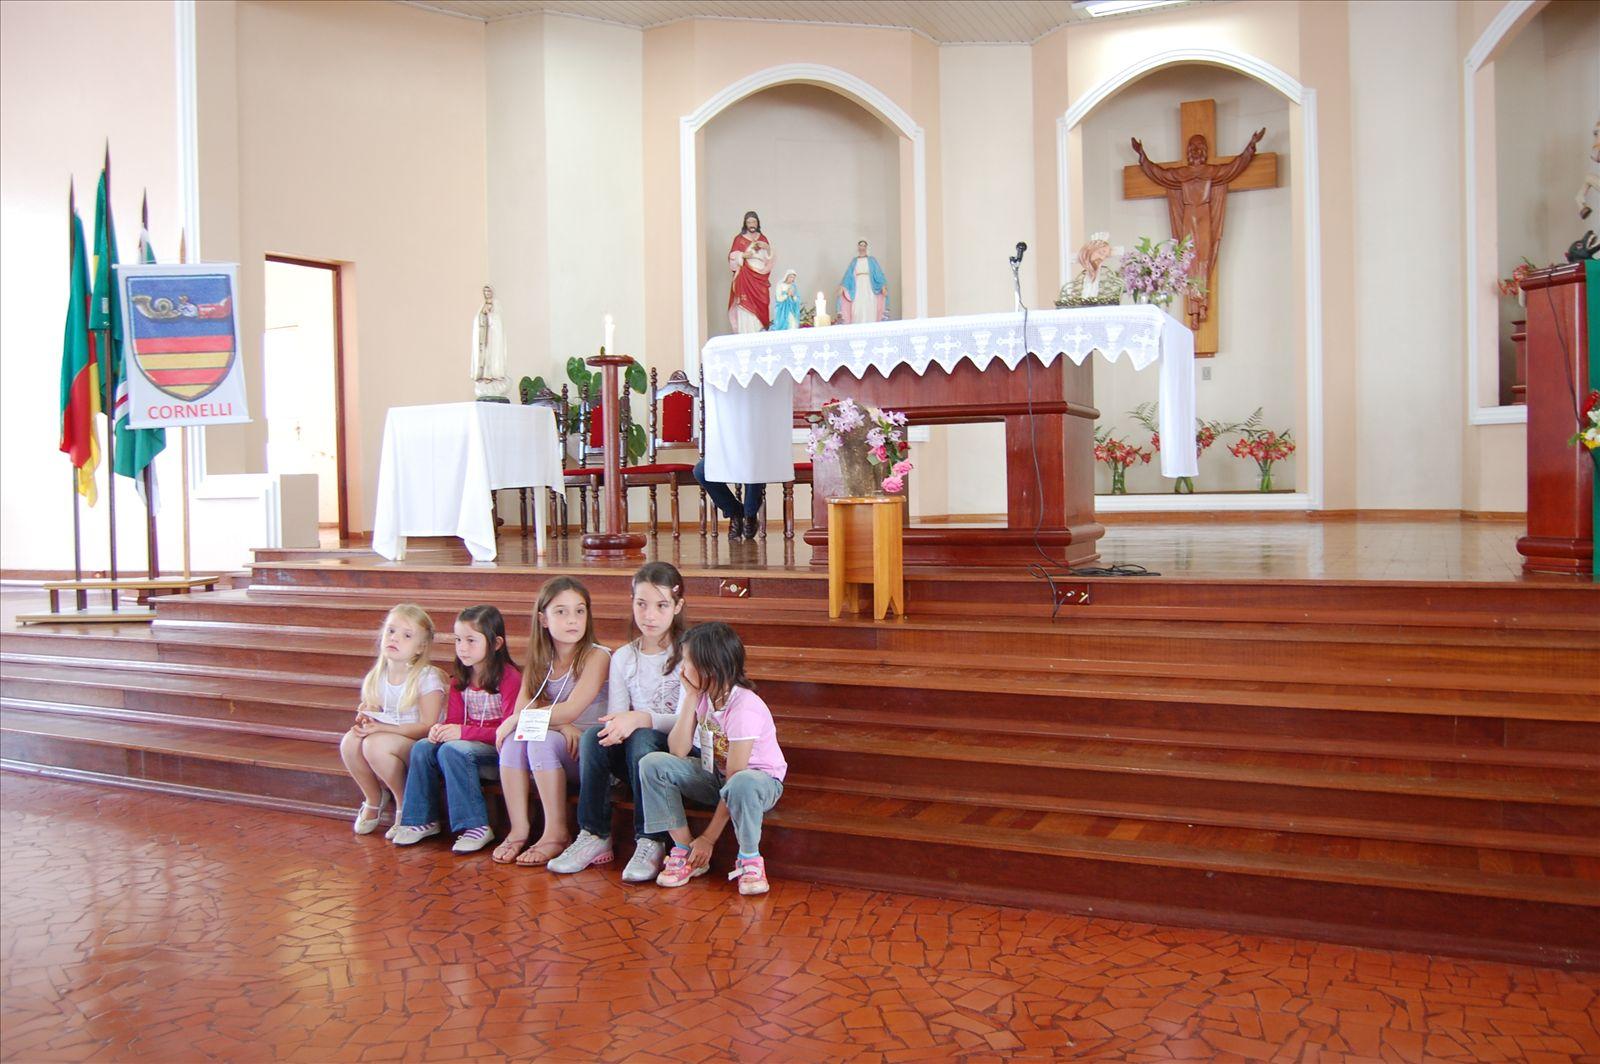 2º Encontro Família Cornelli - 11.10.2009 (141)_0